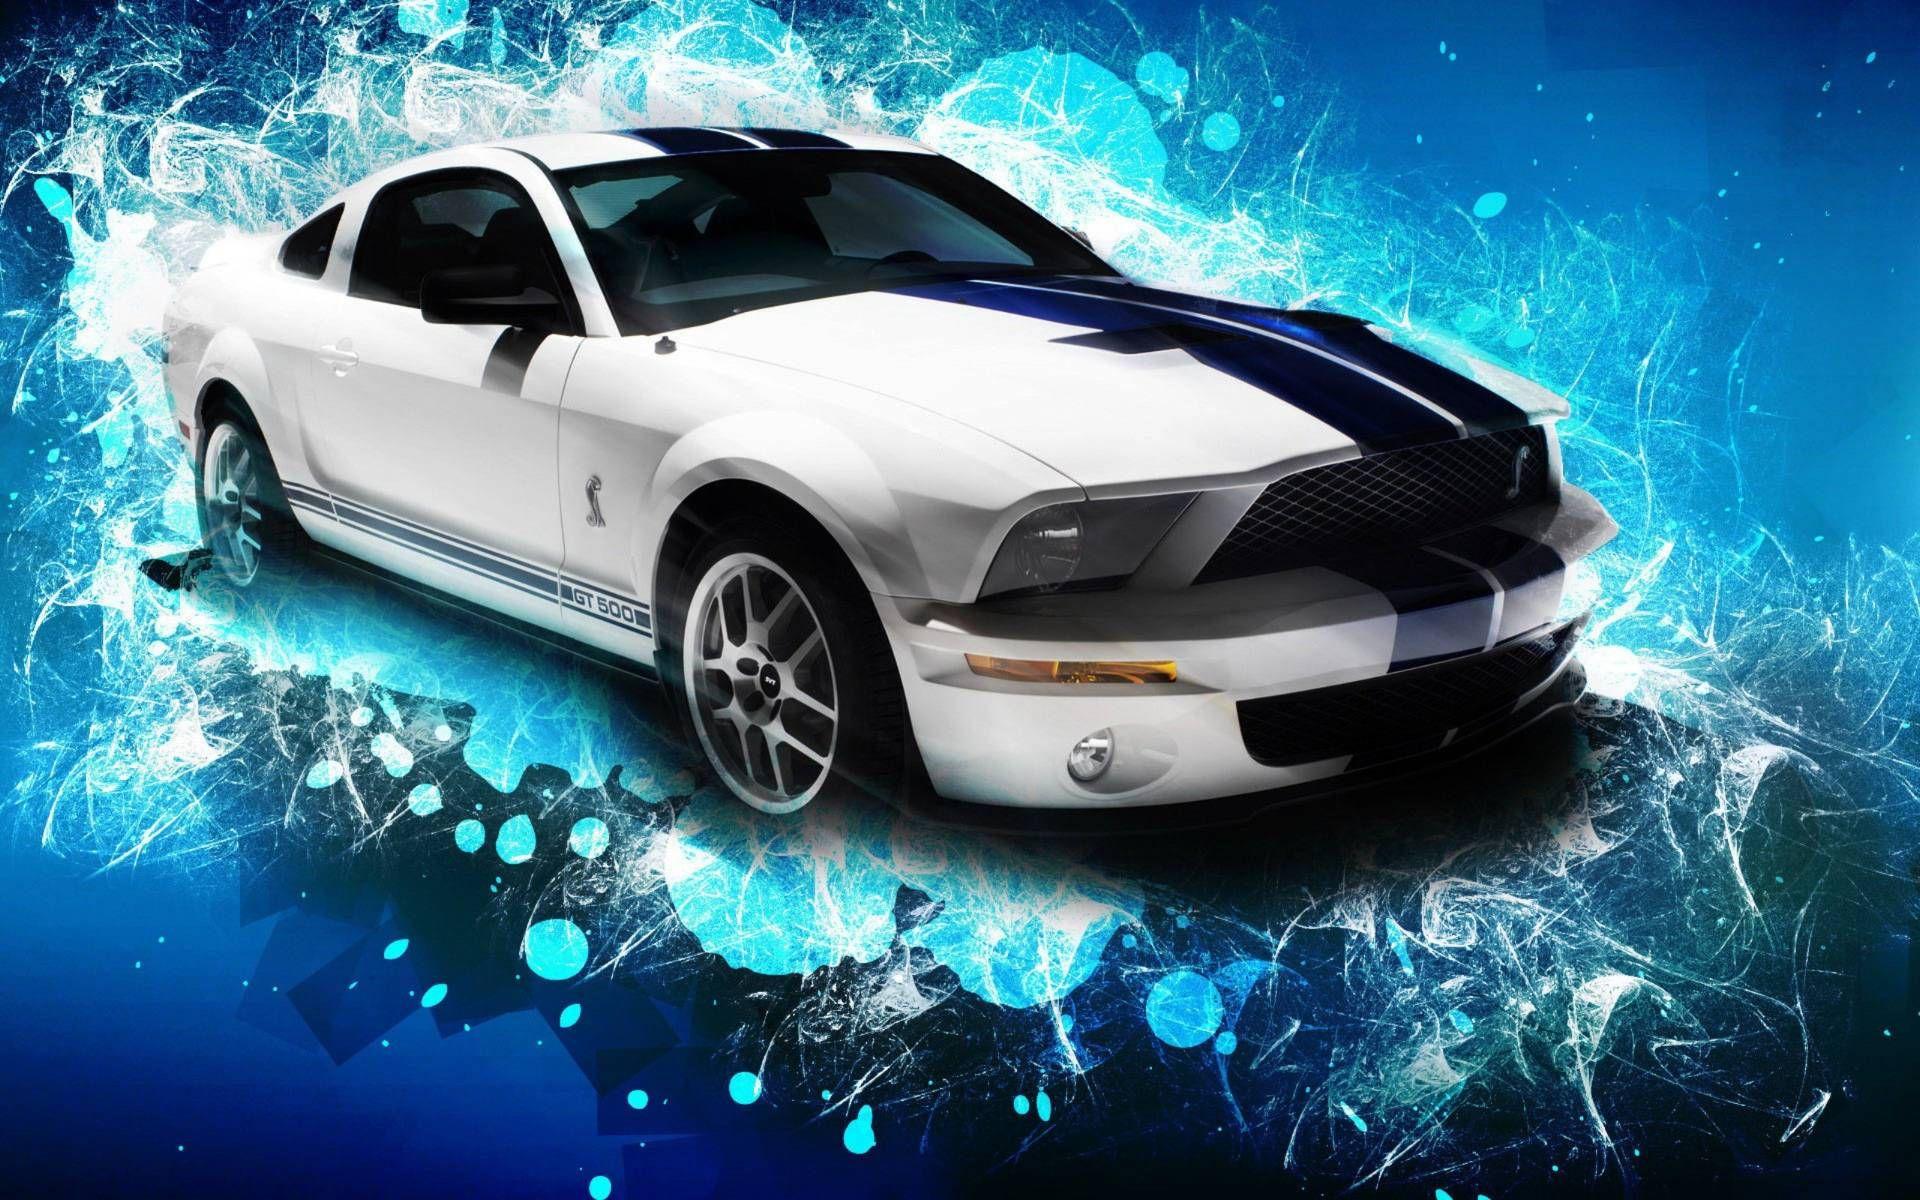 3 d walpeper | ford mustang car 3d widescreen hd wallpaper | places